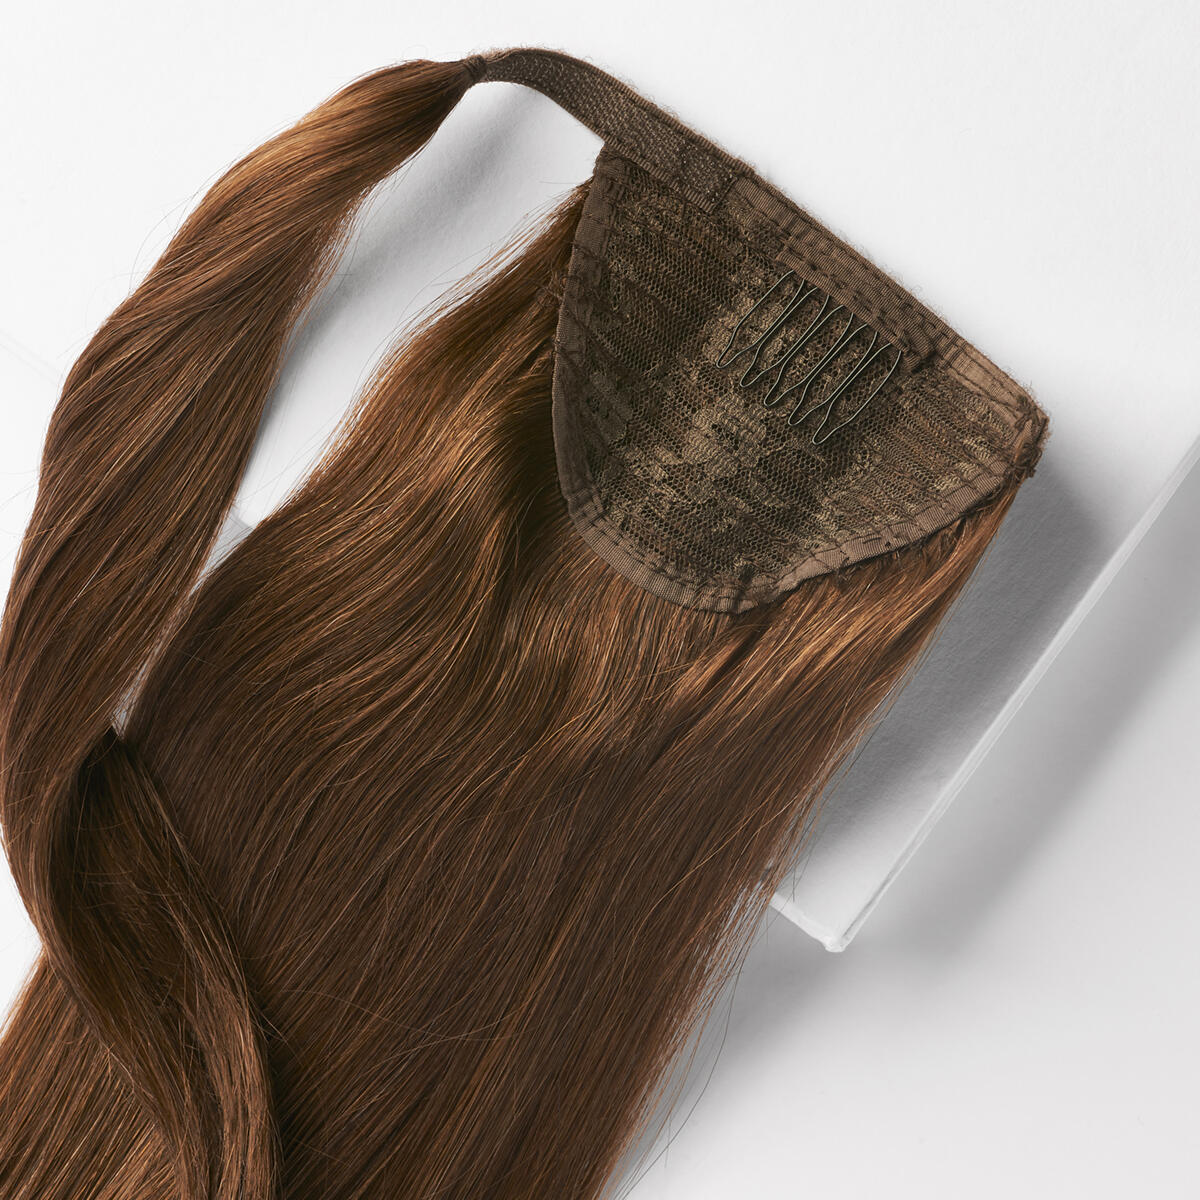 Clip-in Ponytail Ponytail made of real hair 2.0 Dark Brown 30 cm